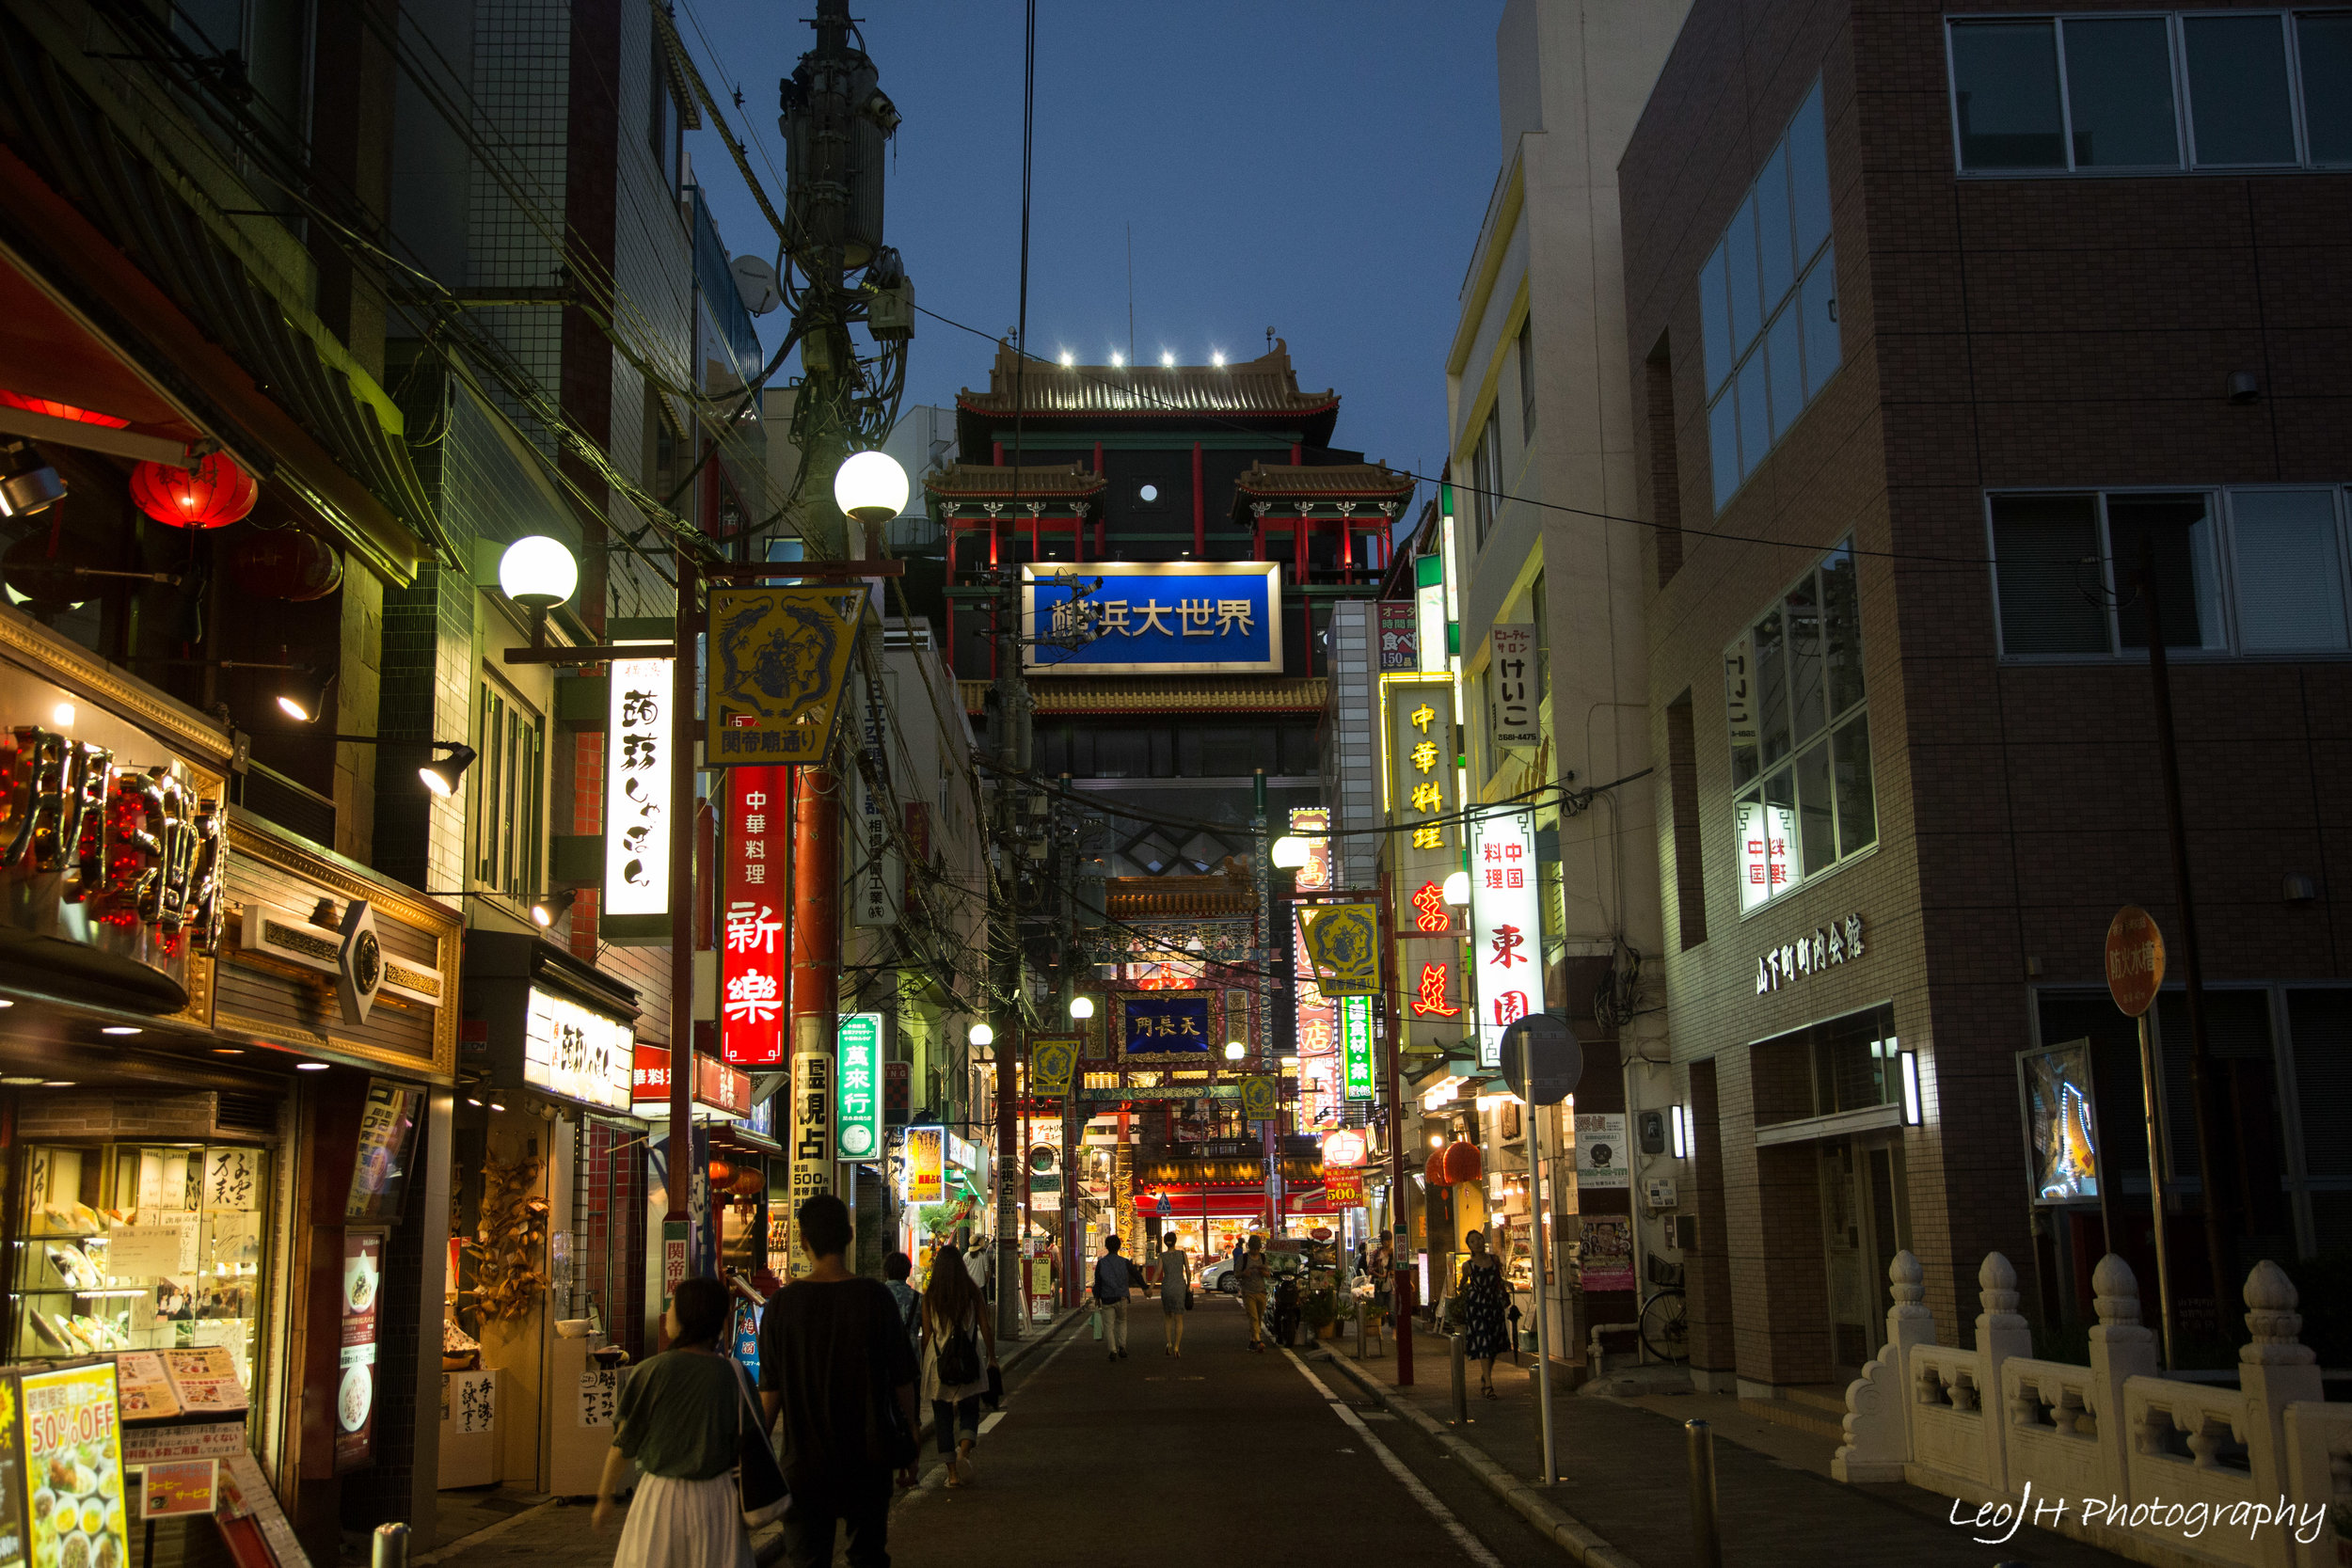 More streets of Yokohama Chinatown